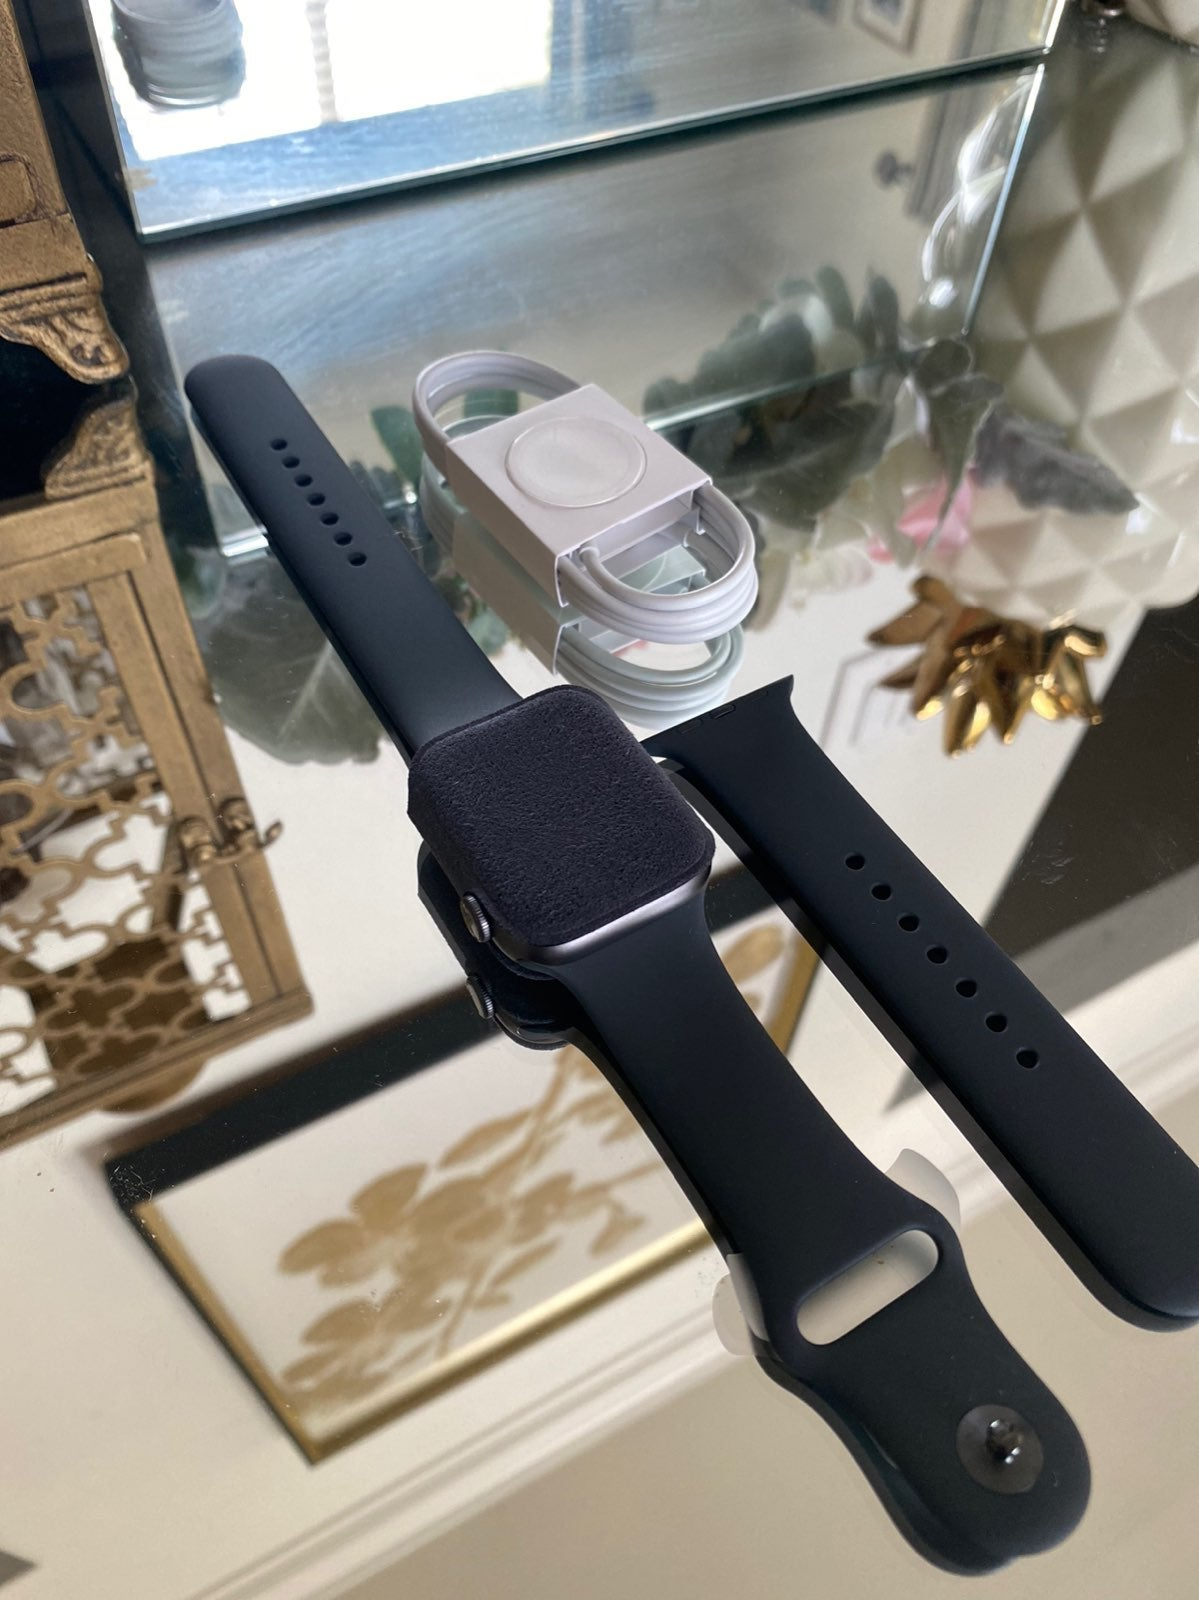 Apple Watch Series 5 44mm Aluminum Space